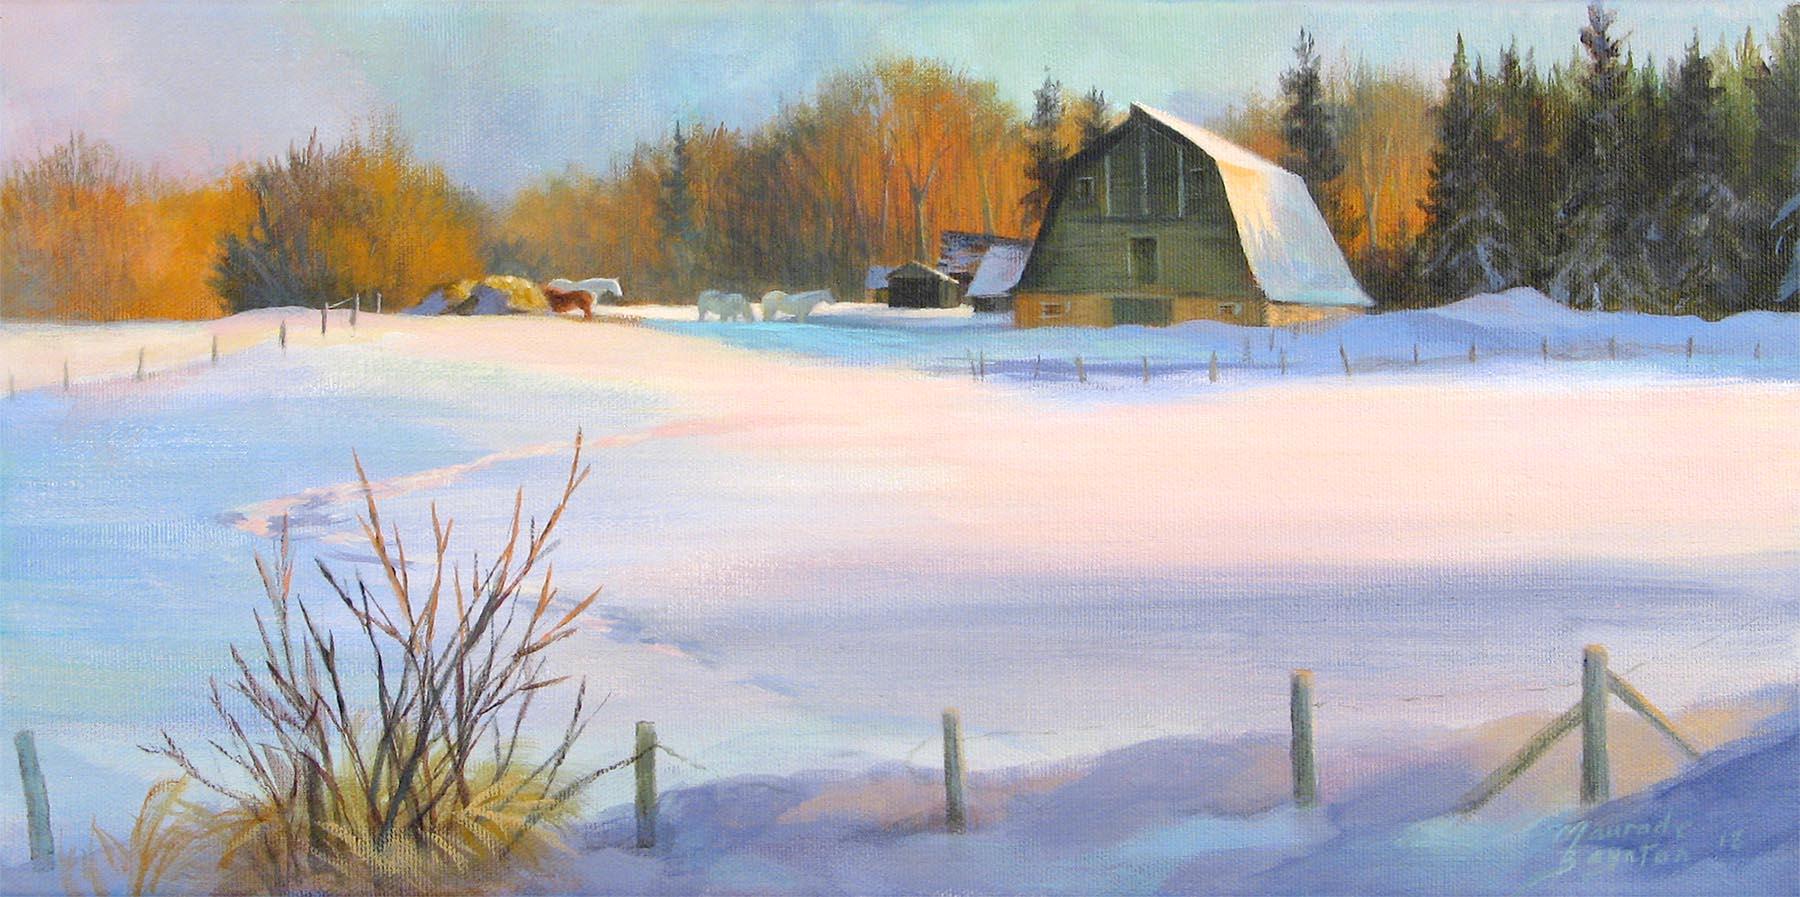 Alberta Winter Barn - Maurade Baynton